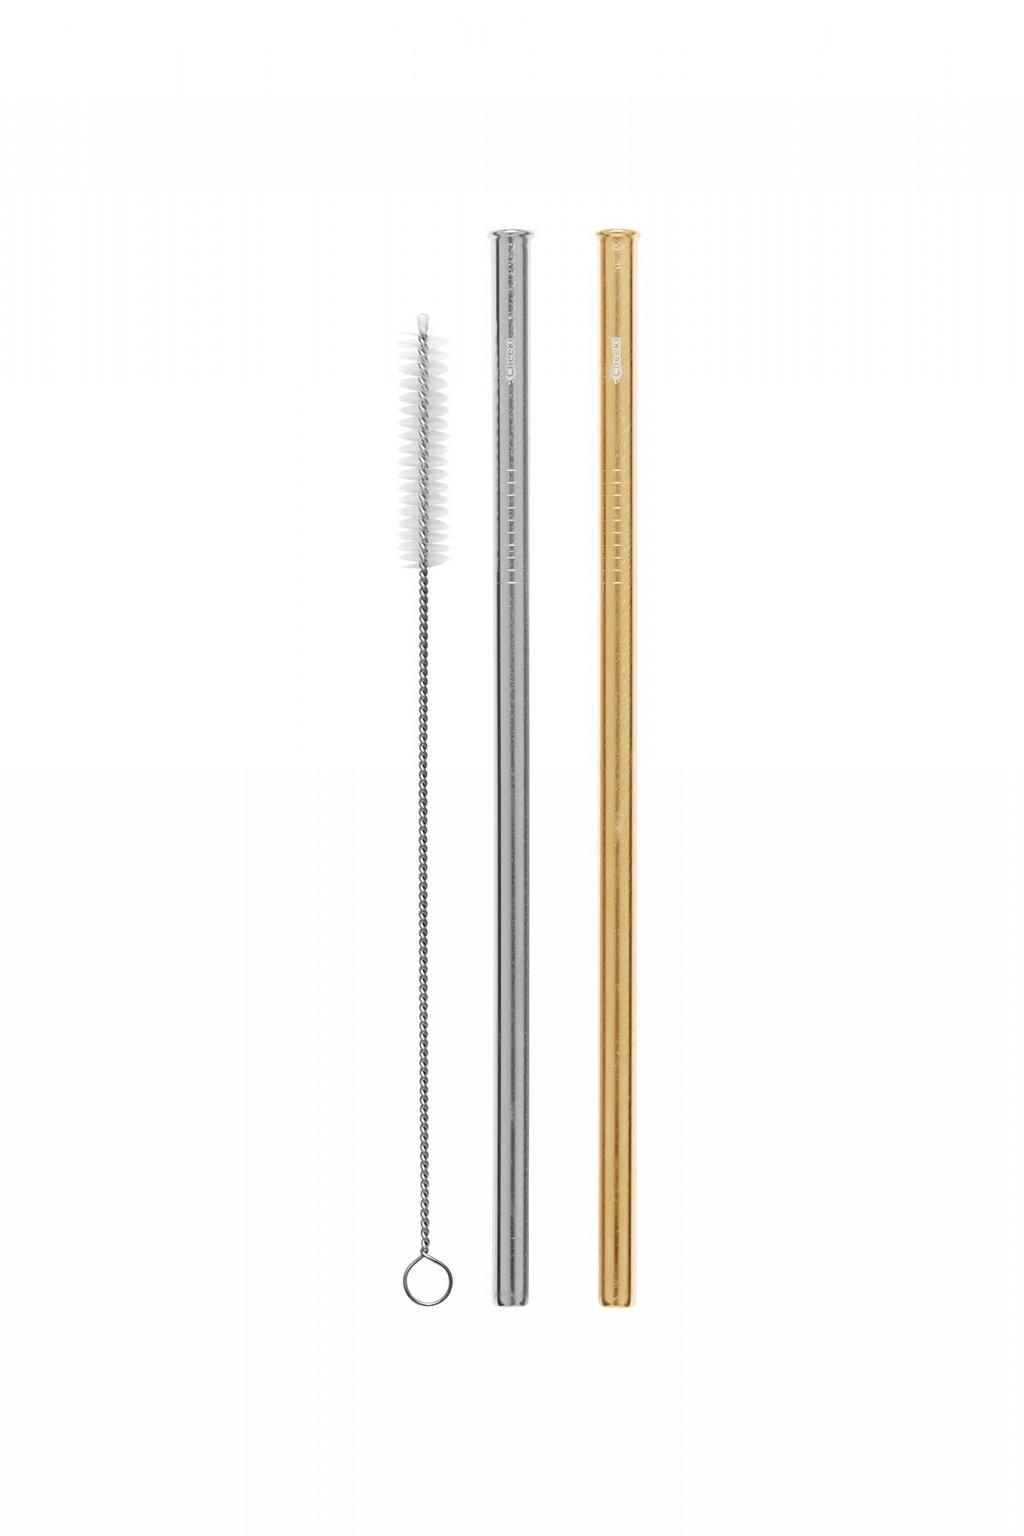 Nerezové slamky Cheeki silver + gold - 2ks s kefkou na čistenie